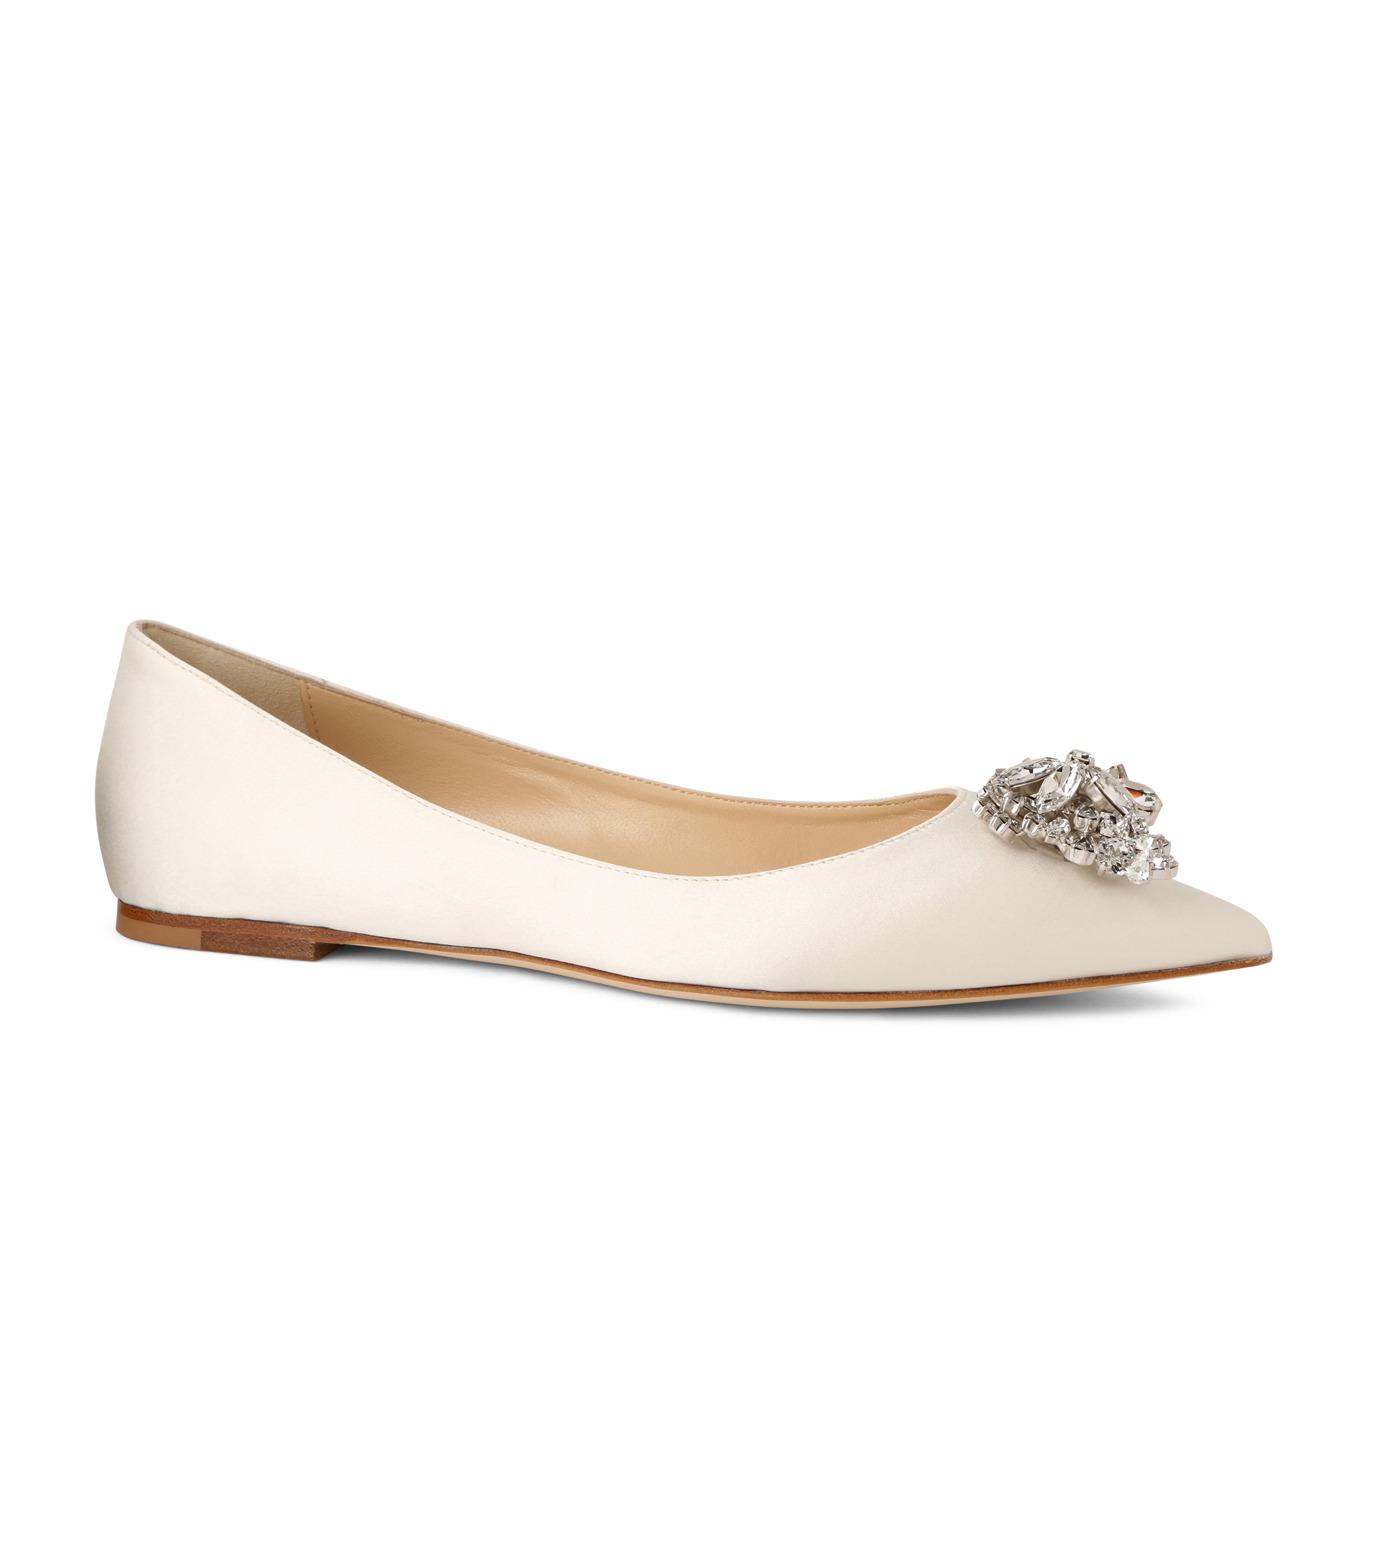 Jimmy Choo(ジミーチュウ)の010STV Satin Flat w/Crystal Brooch-WHITE(フラットシューズ/Flat shoes)-ALINA-5 拡大詳細画像1